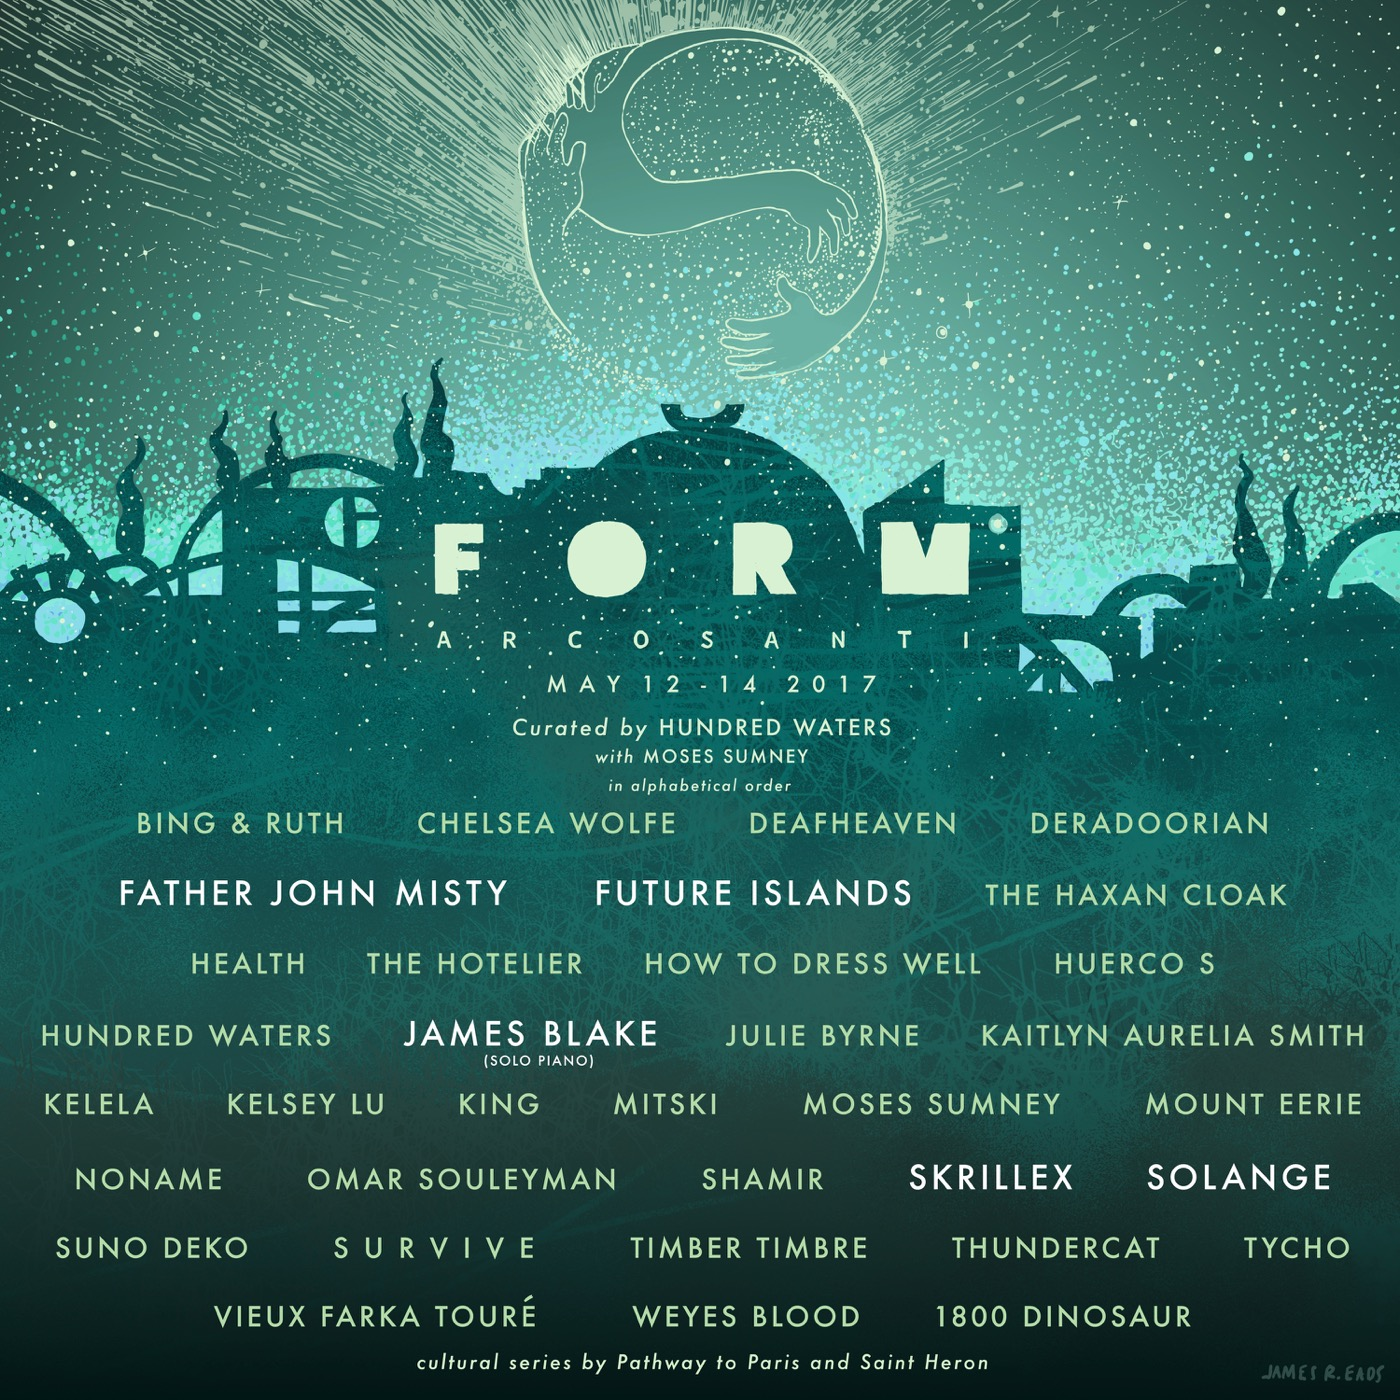 form arcosanti 2017 art final Solange, James Blake, Father John Misty to play FORM Arcosanti 2017